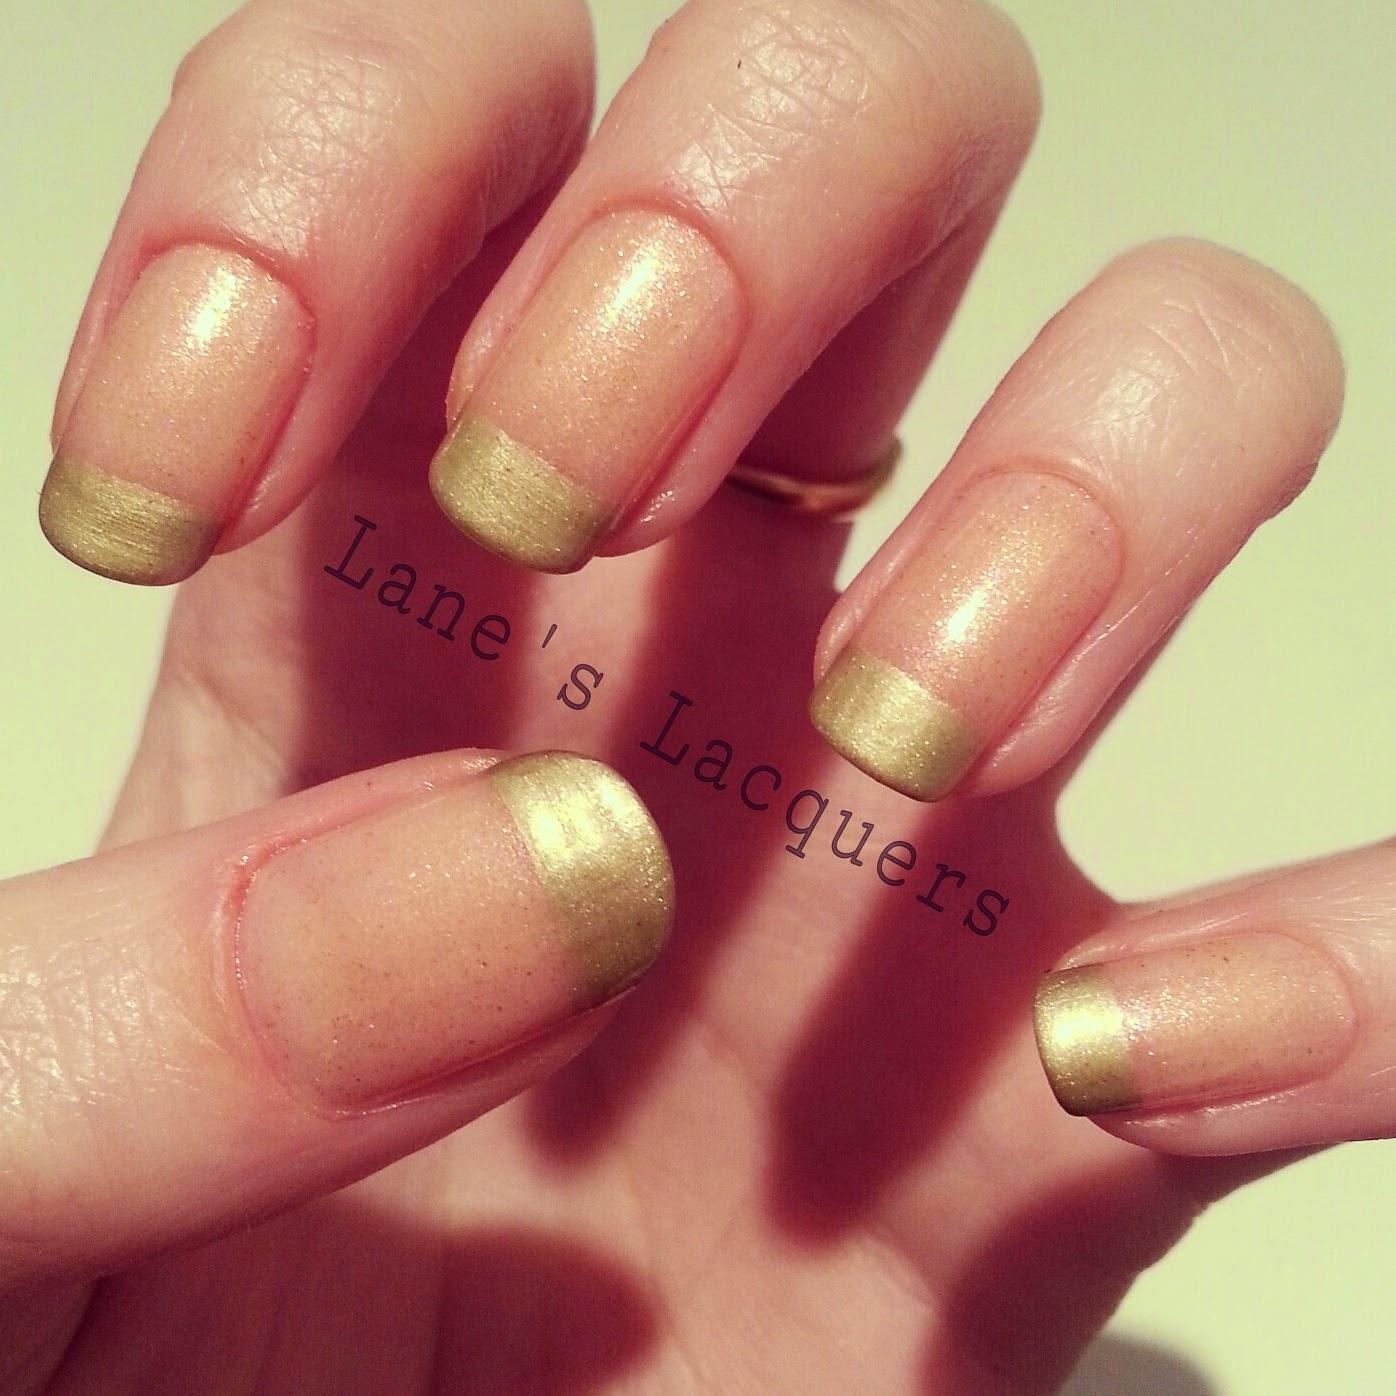 ciate-mini-mani-manor-sloaney-sweetie-white-glitter-nails (1)